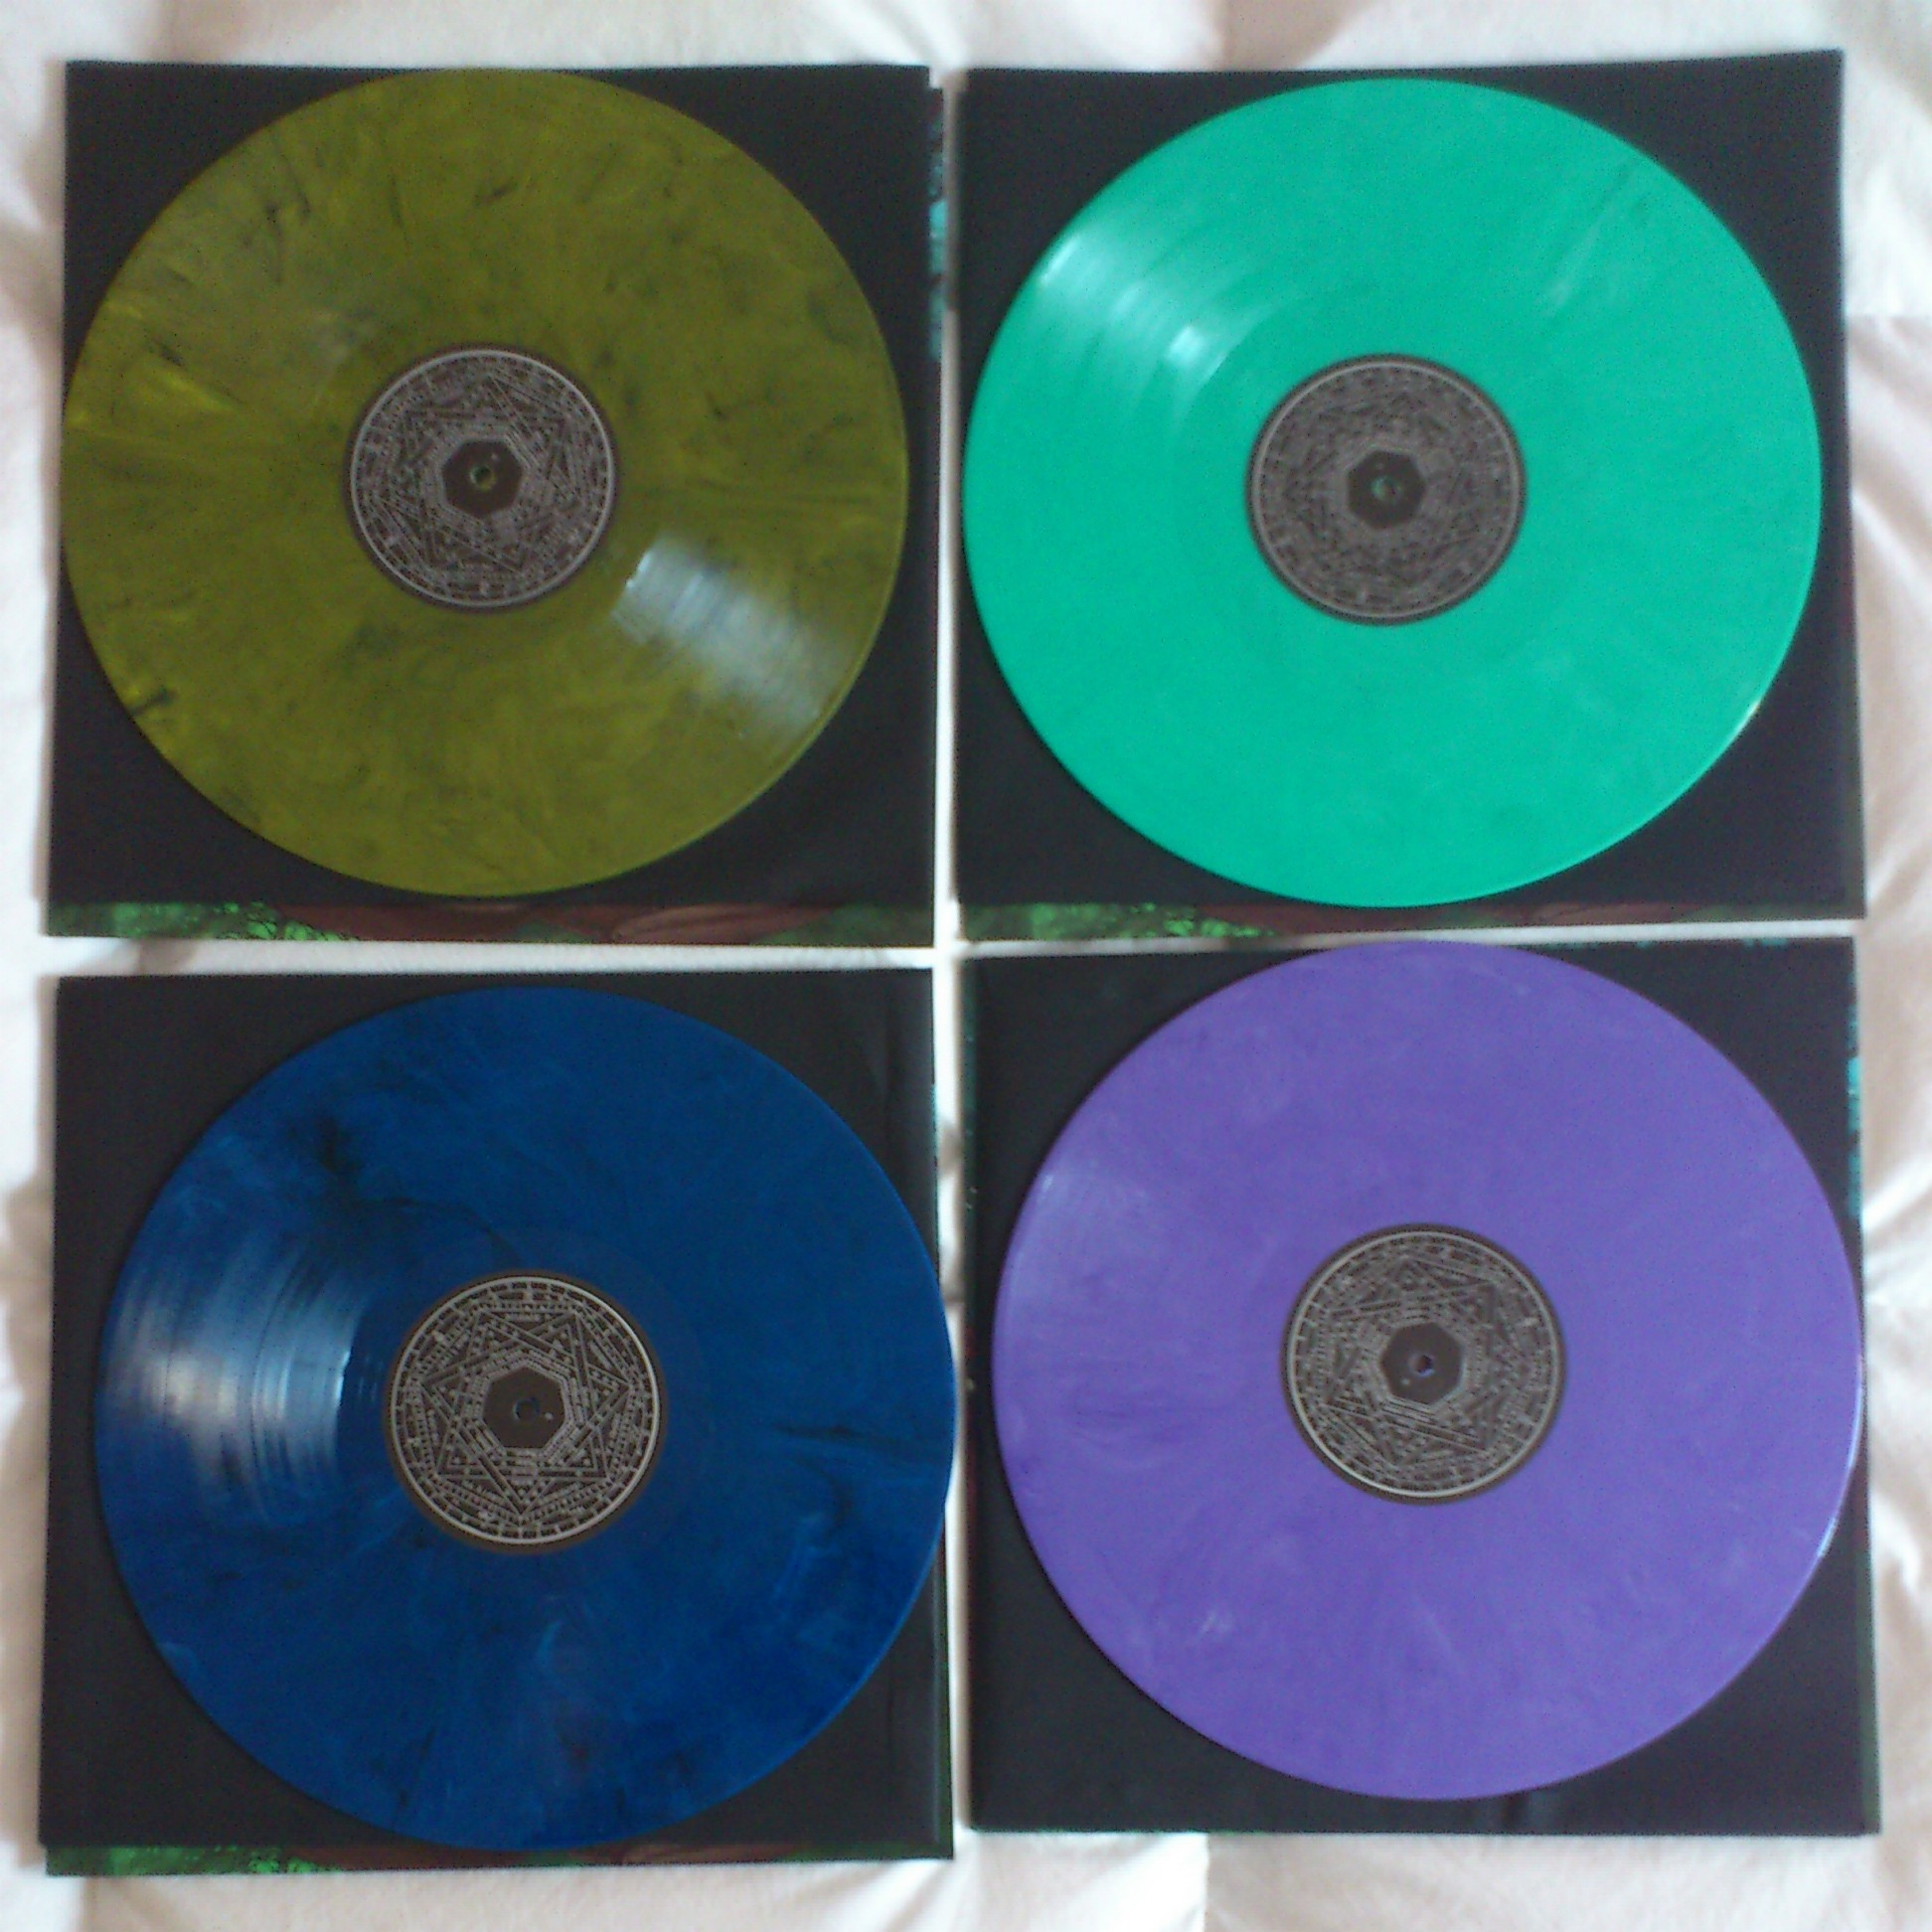 TOUNDRA (III) LP